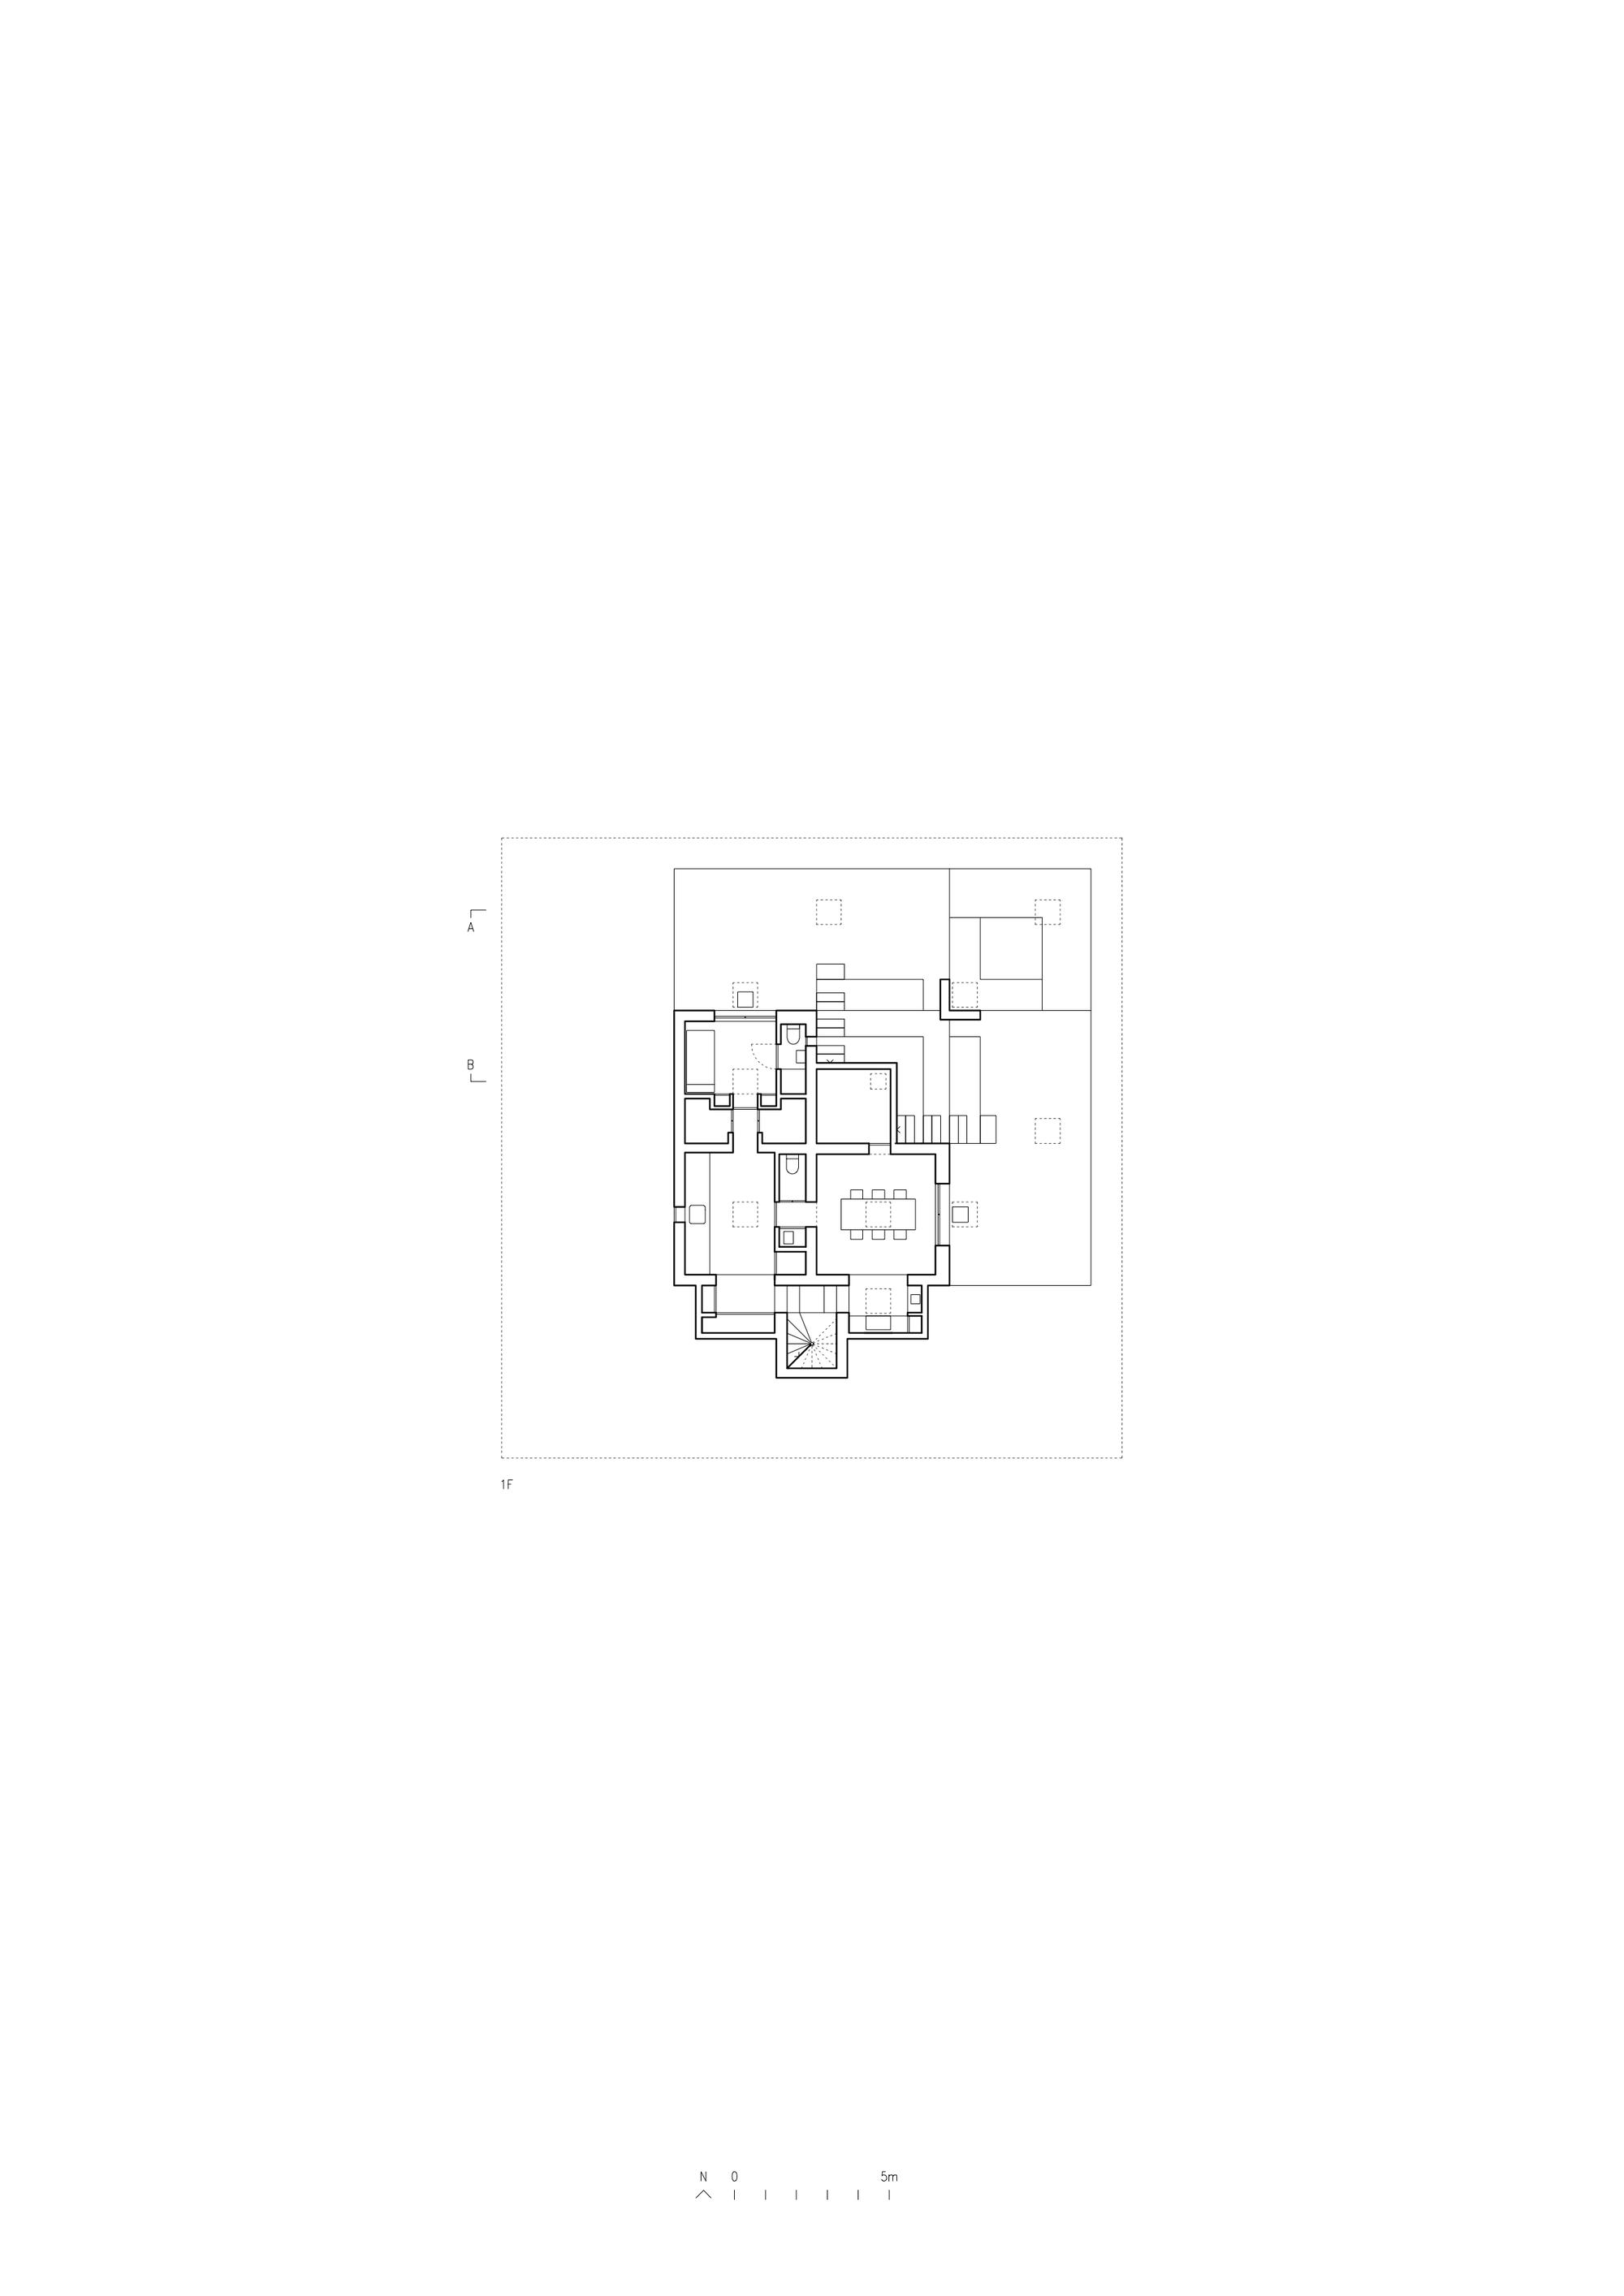 54aaf739e58ecee47e0000eb_guna-house-pezo-von-ellrichshausen_pve_guna_03_plan_01